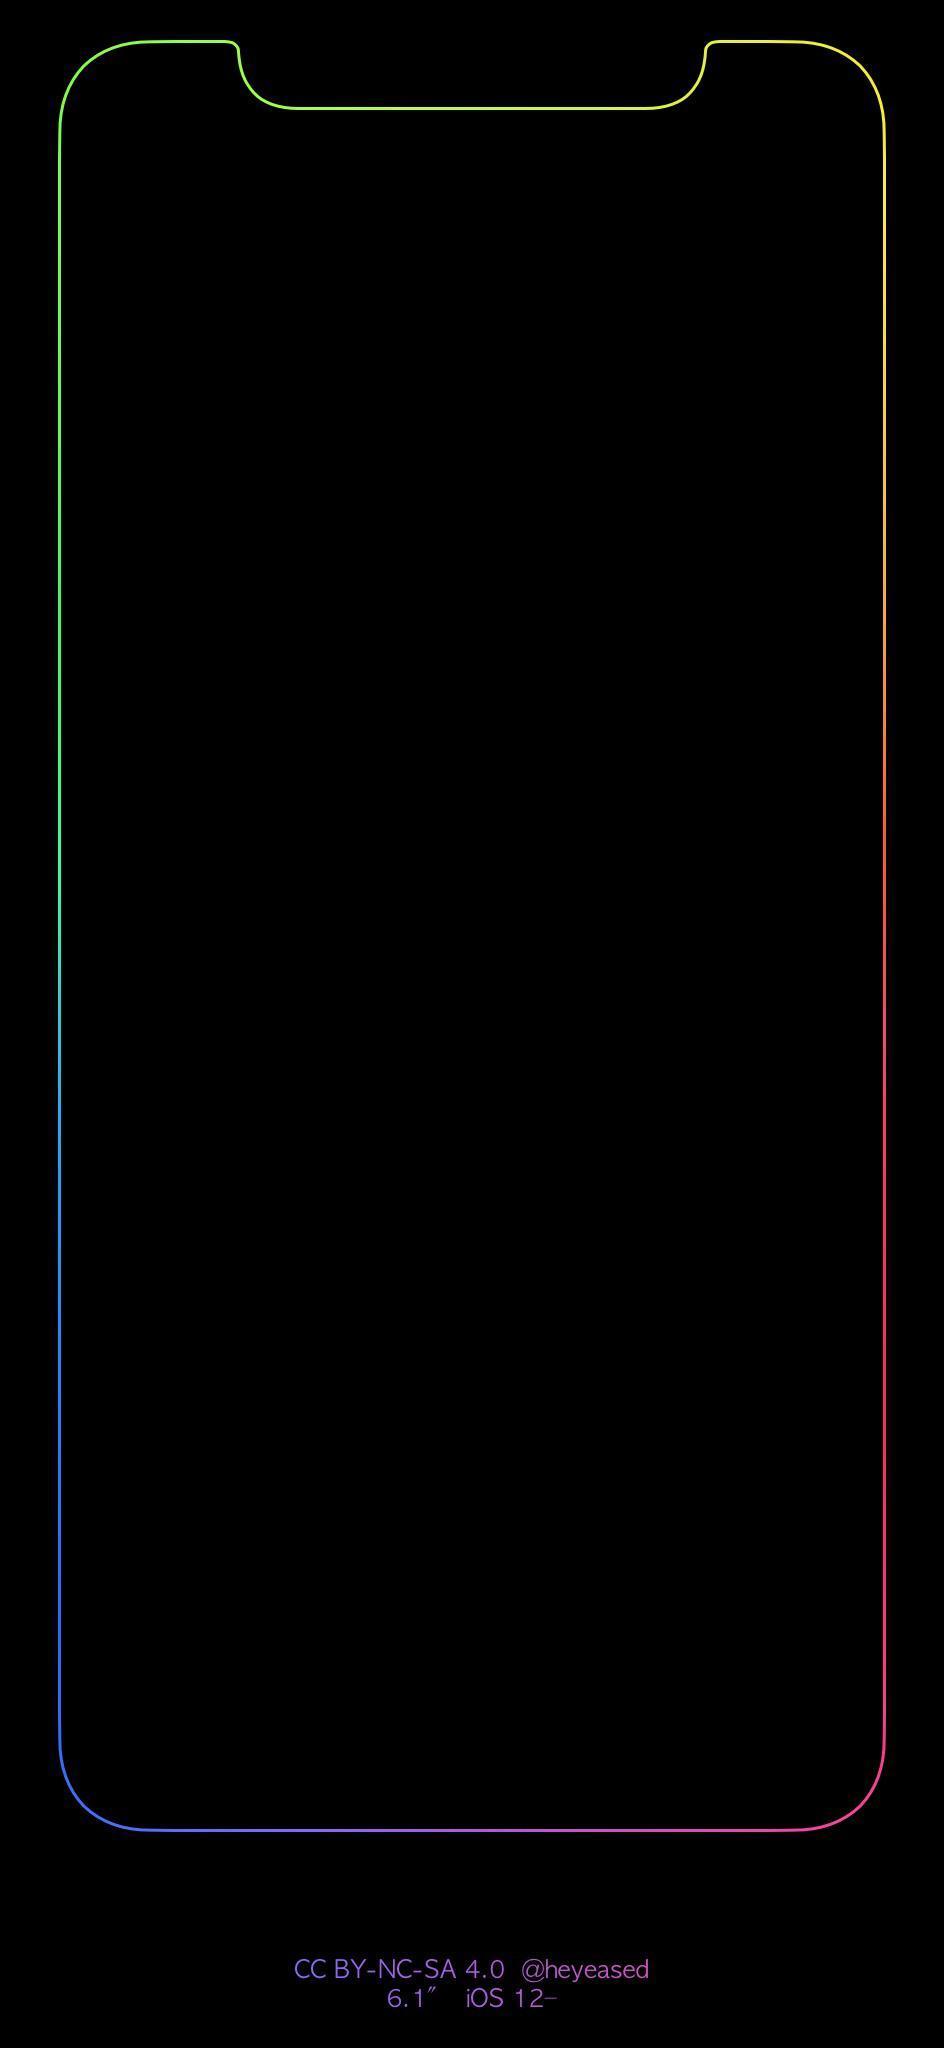 iPhone Wallpapers: Free HD Download [500+ HQ]   Unsplash